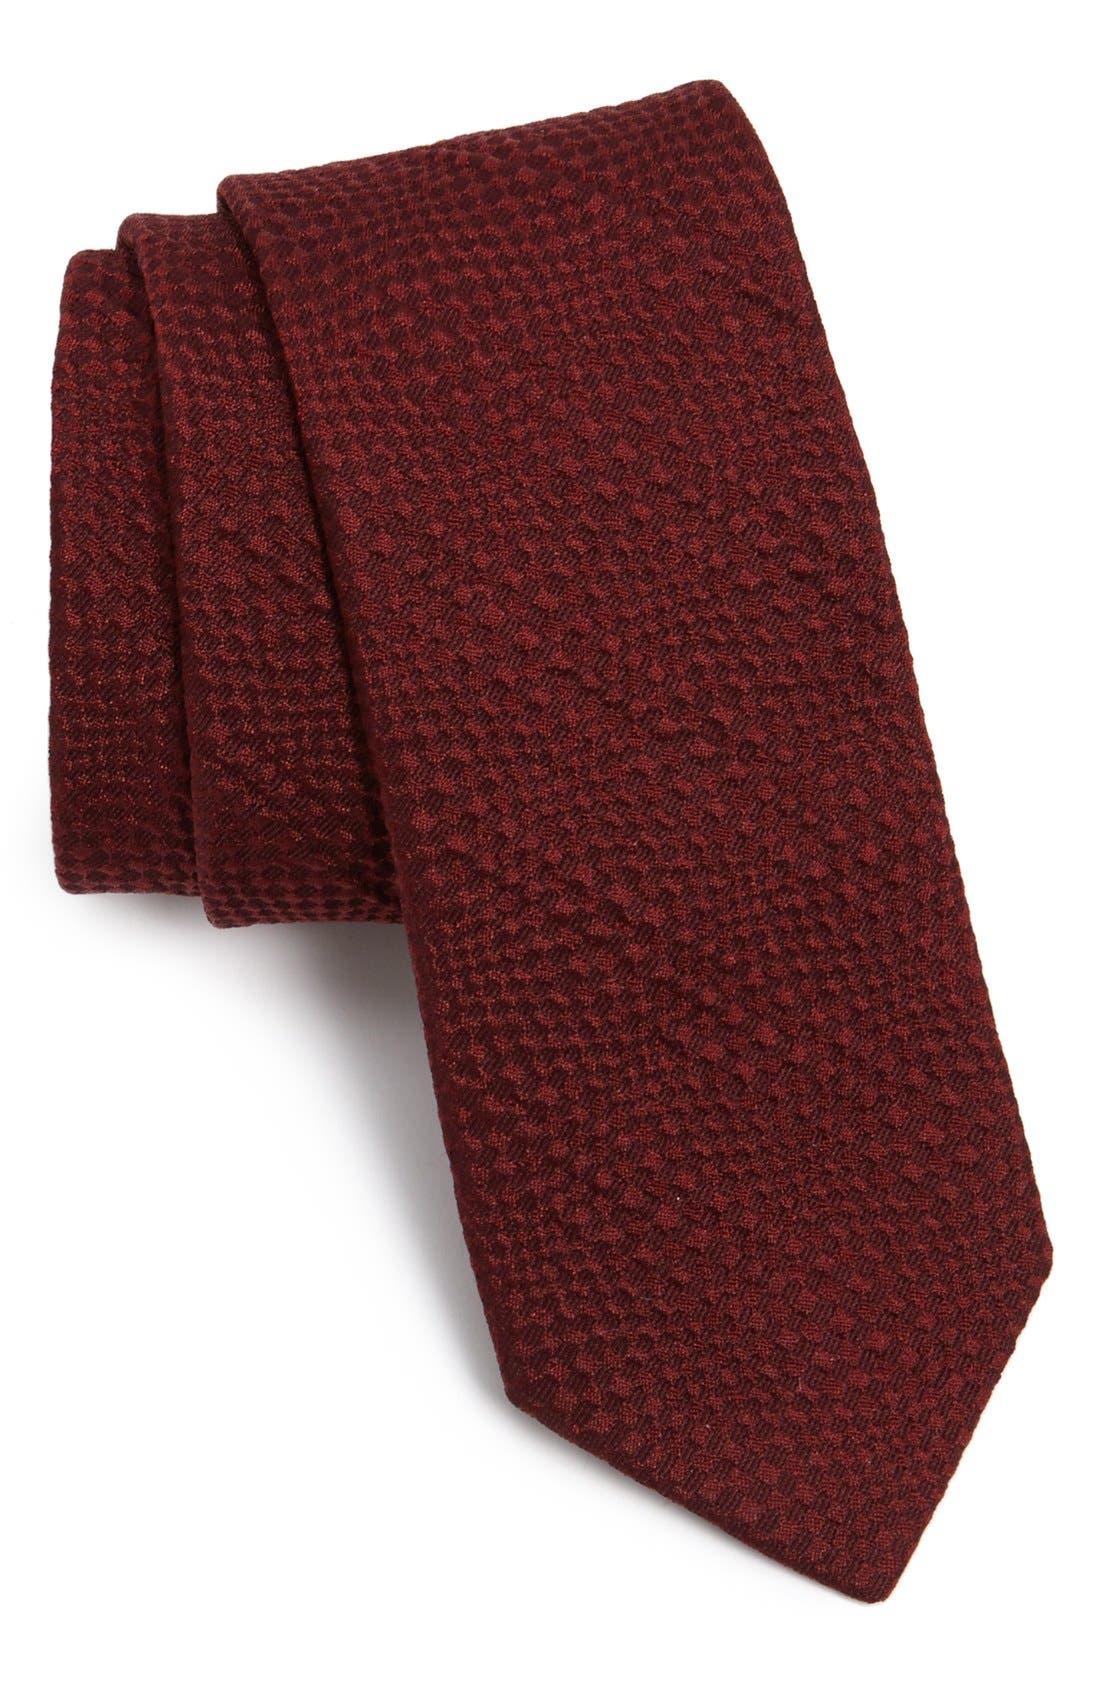 Main Image - Lanvin Textured Woven Tie